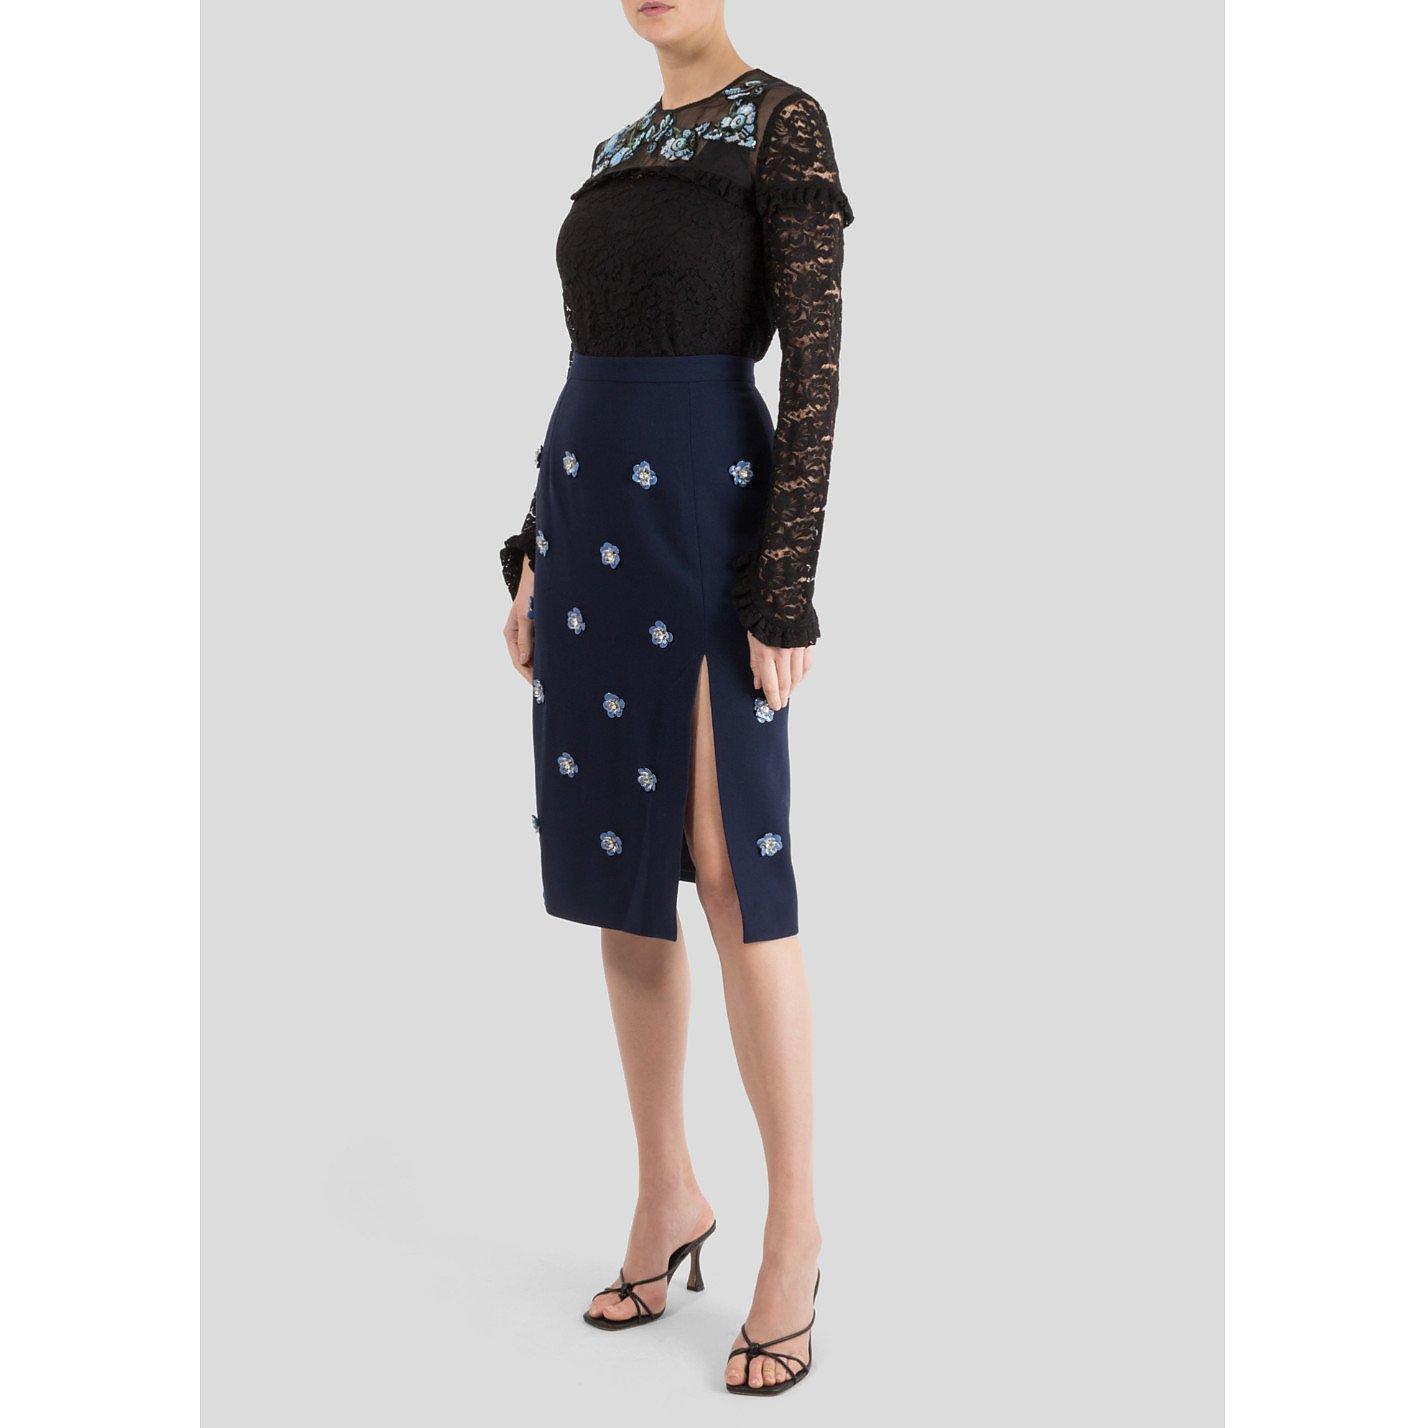 Markus Lupfer Portia Embellished Crepe Skirt